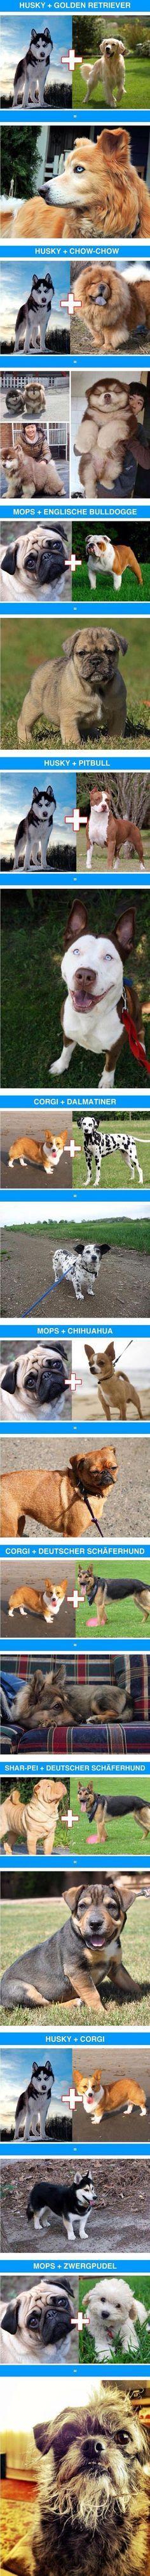 Odd dog cross breed combinations . I want a husky retriever